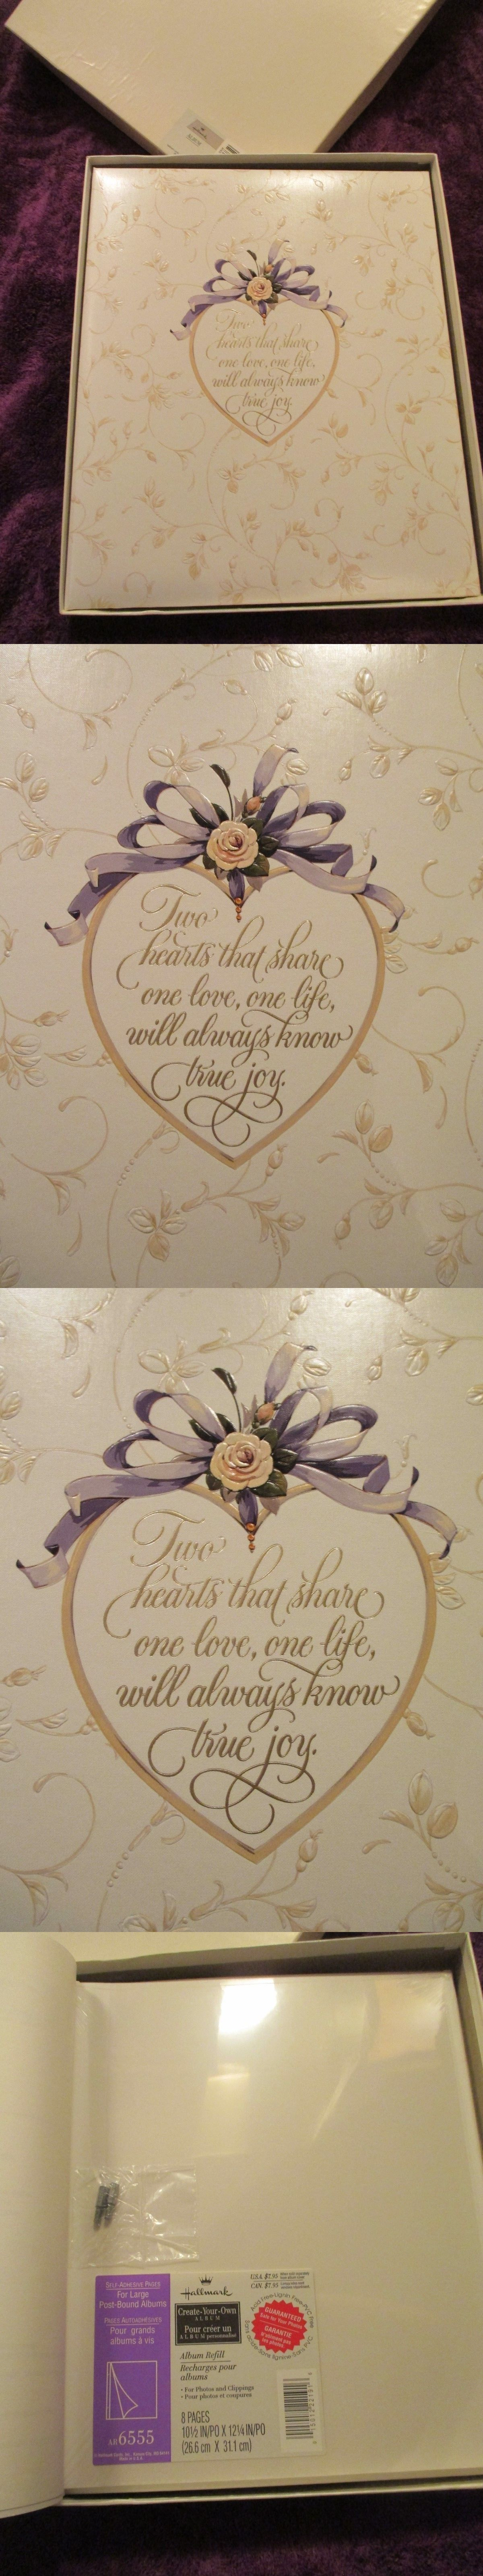 Wedding Po Albums 4X6 | Bnib Beautiful Hallmark Photo Album Wedding Or Anniversary Photo